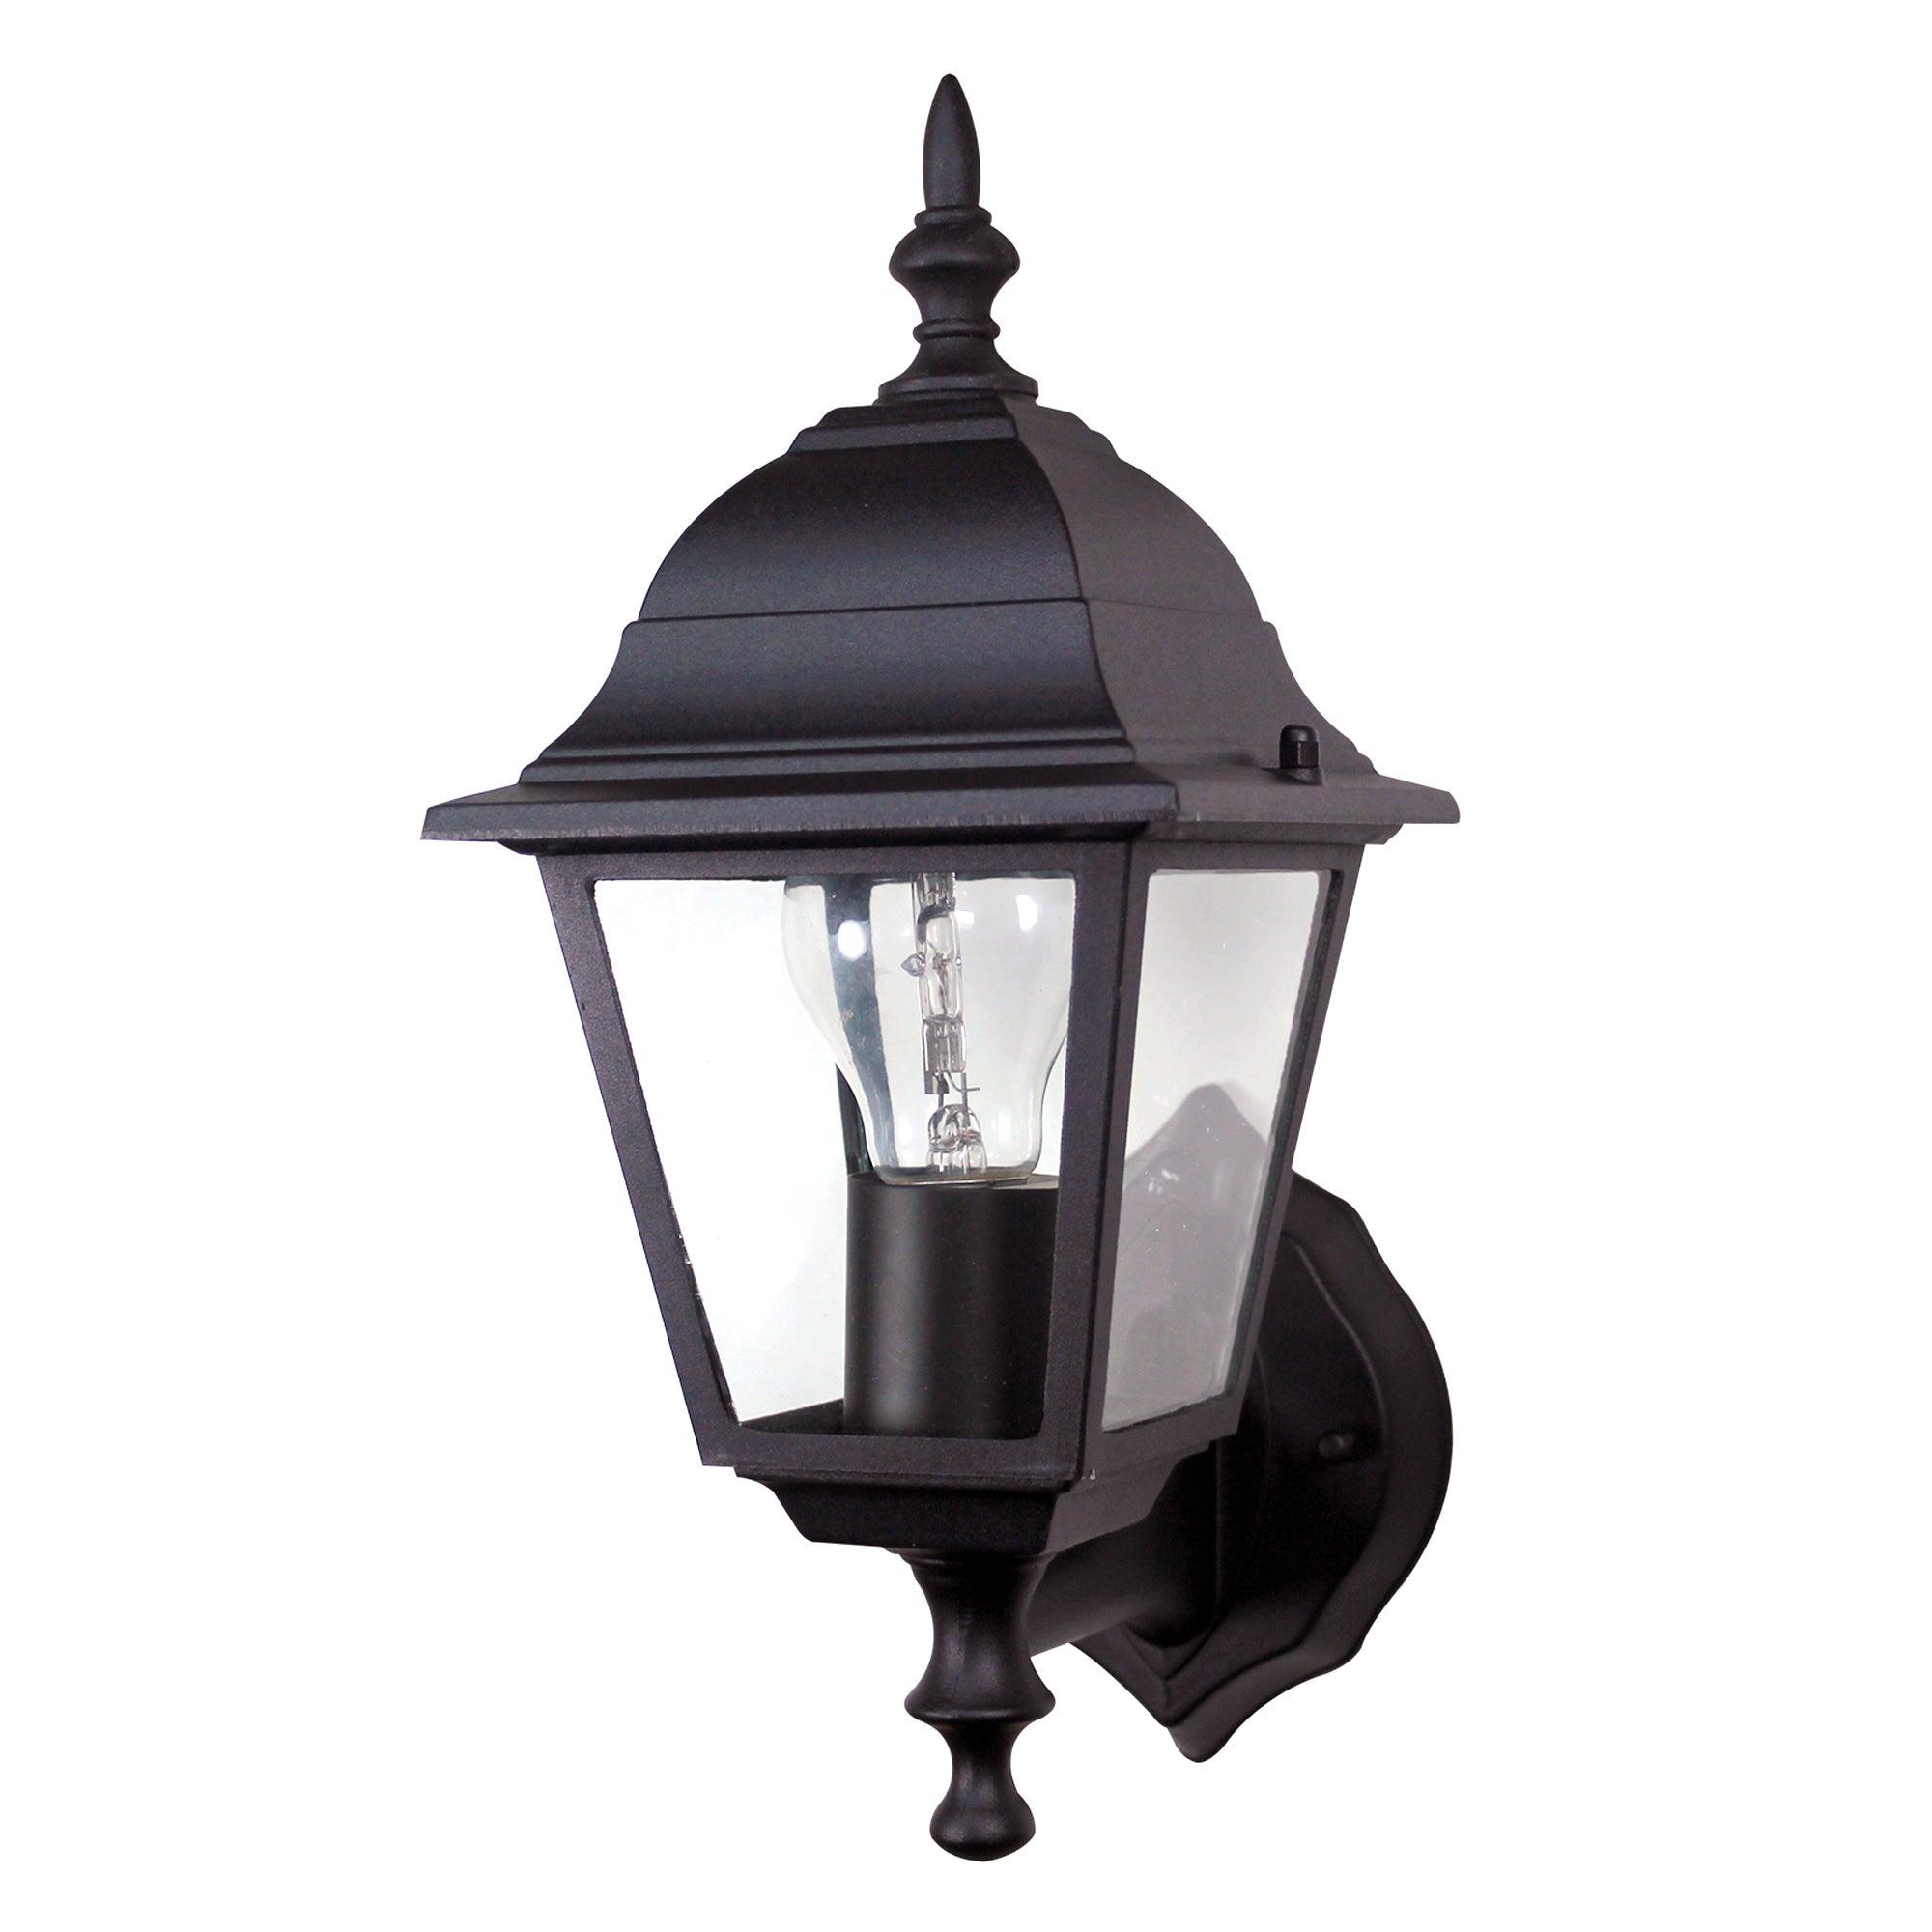 Outdoor 4 Sided Lantern